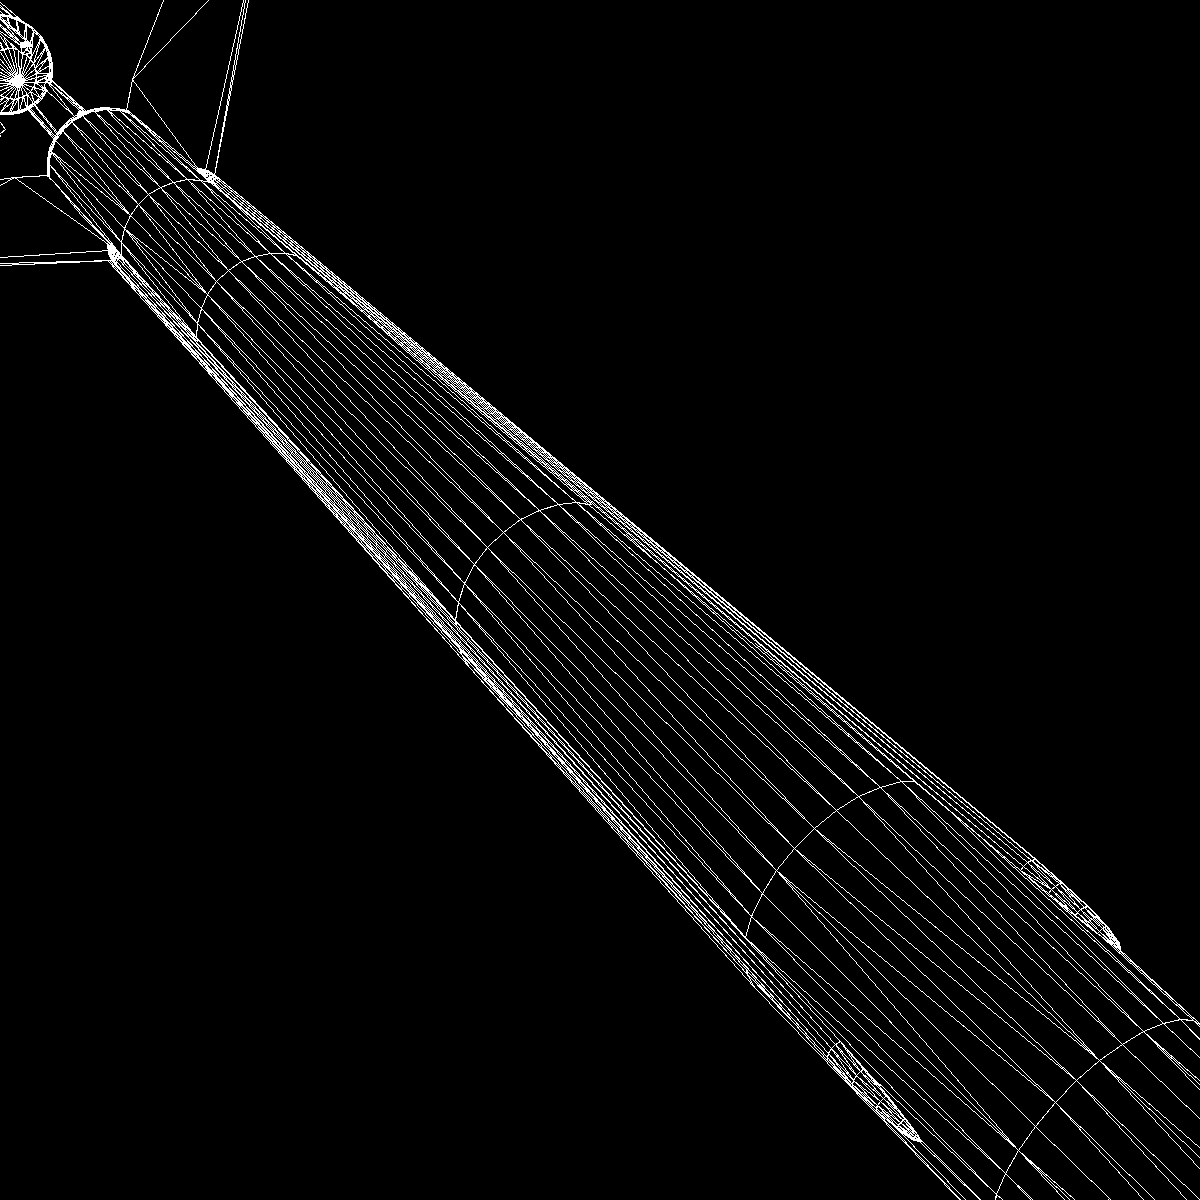 nasa aerobee 100 rocket 3d model 3ds dxf fbx blend cob dae x  obj 158439